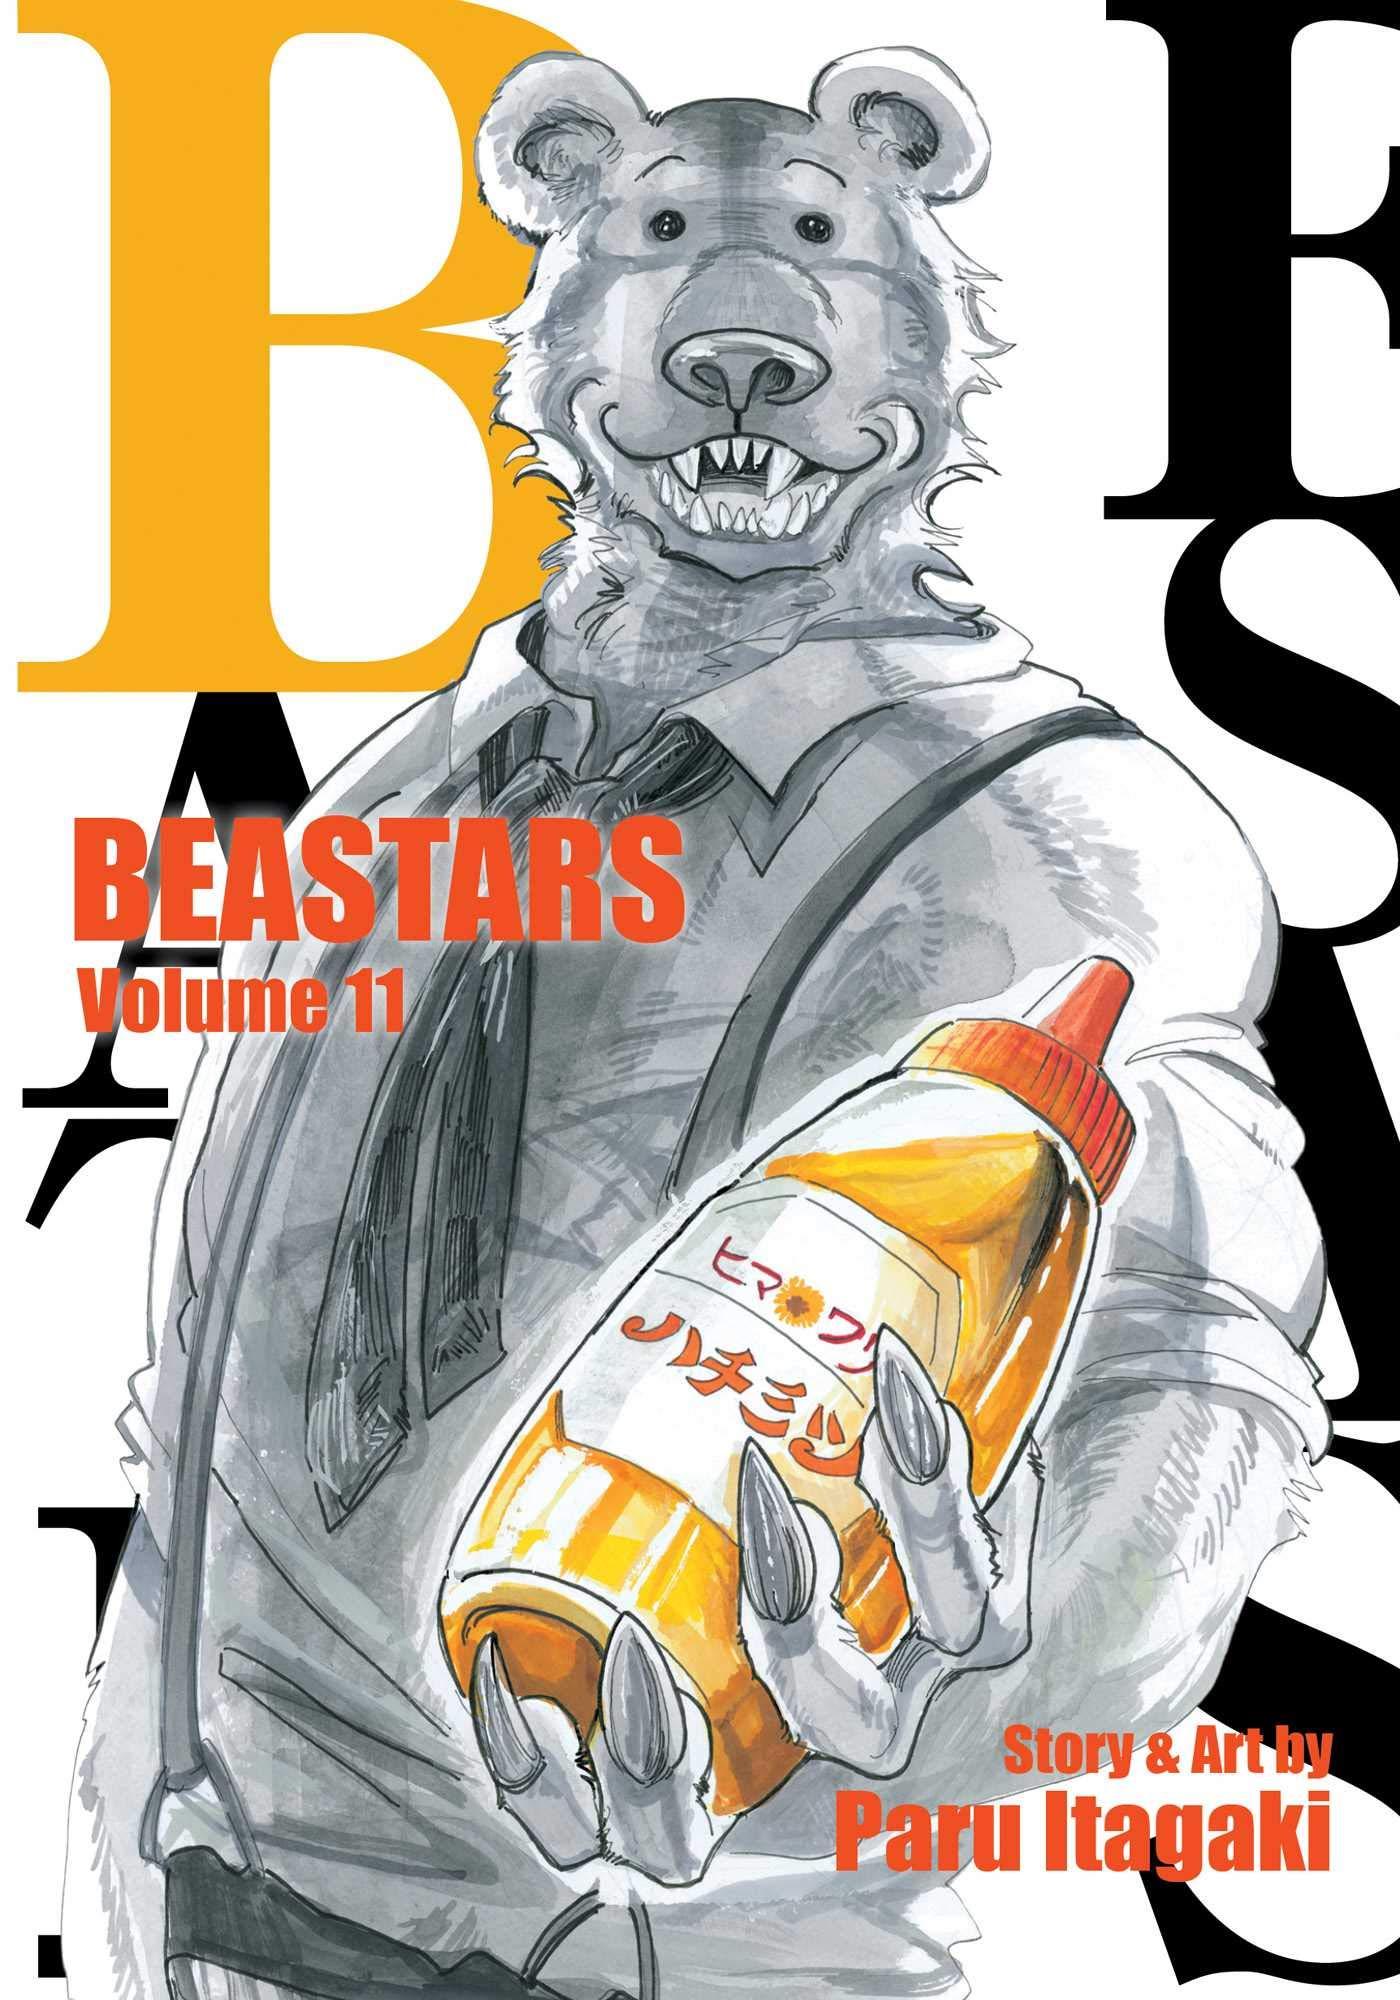 『BEASTARS』Vol.11